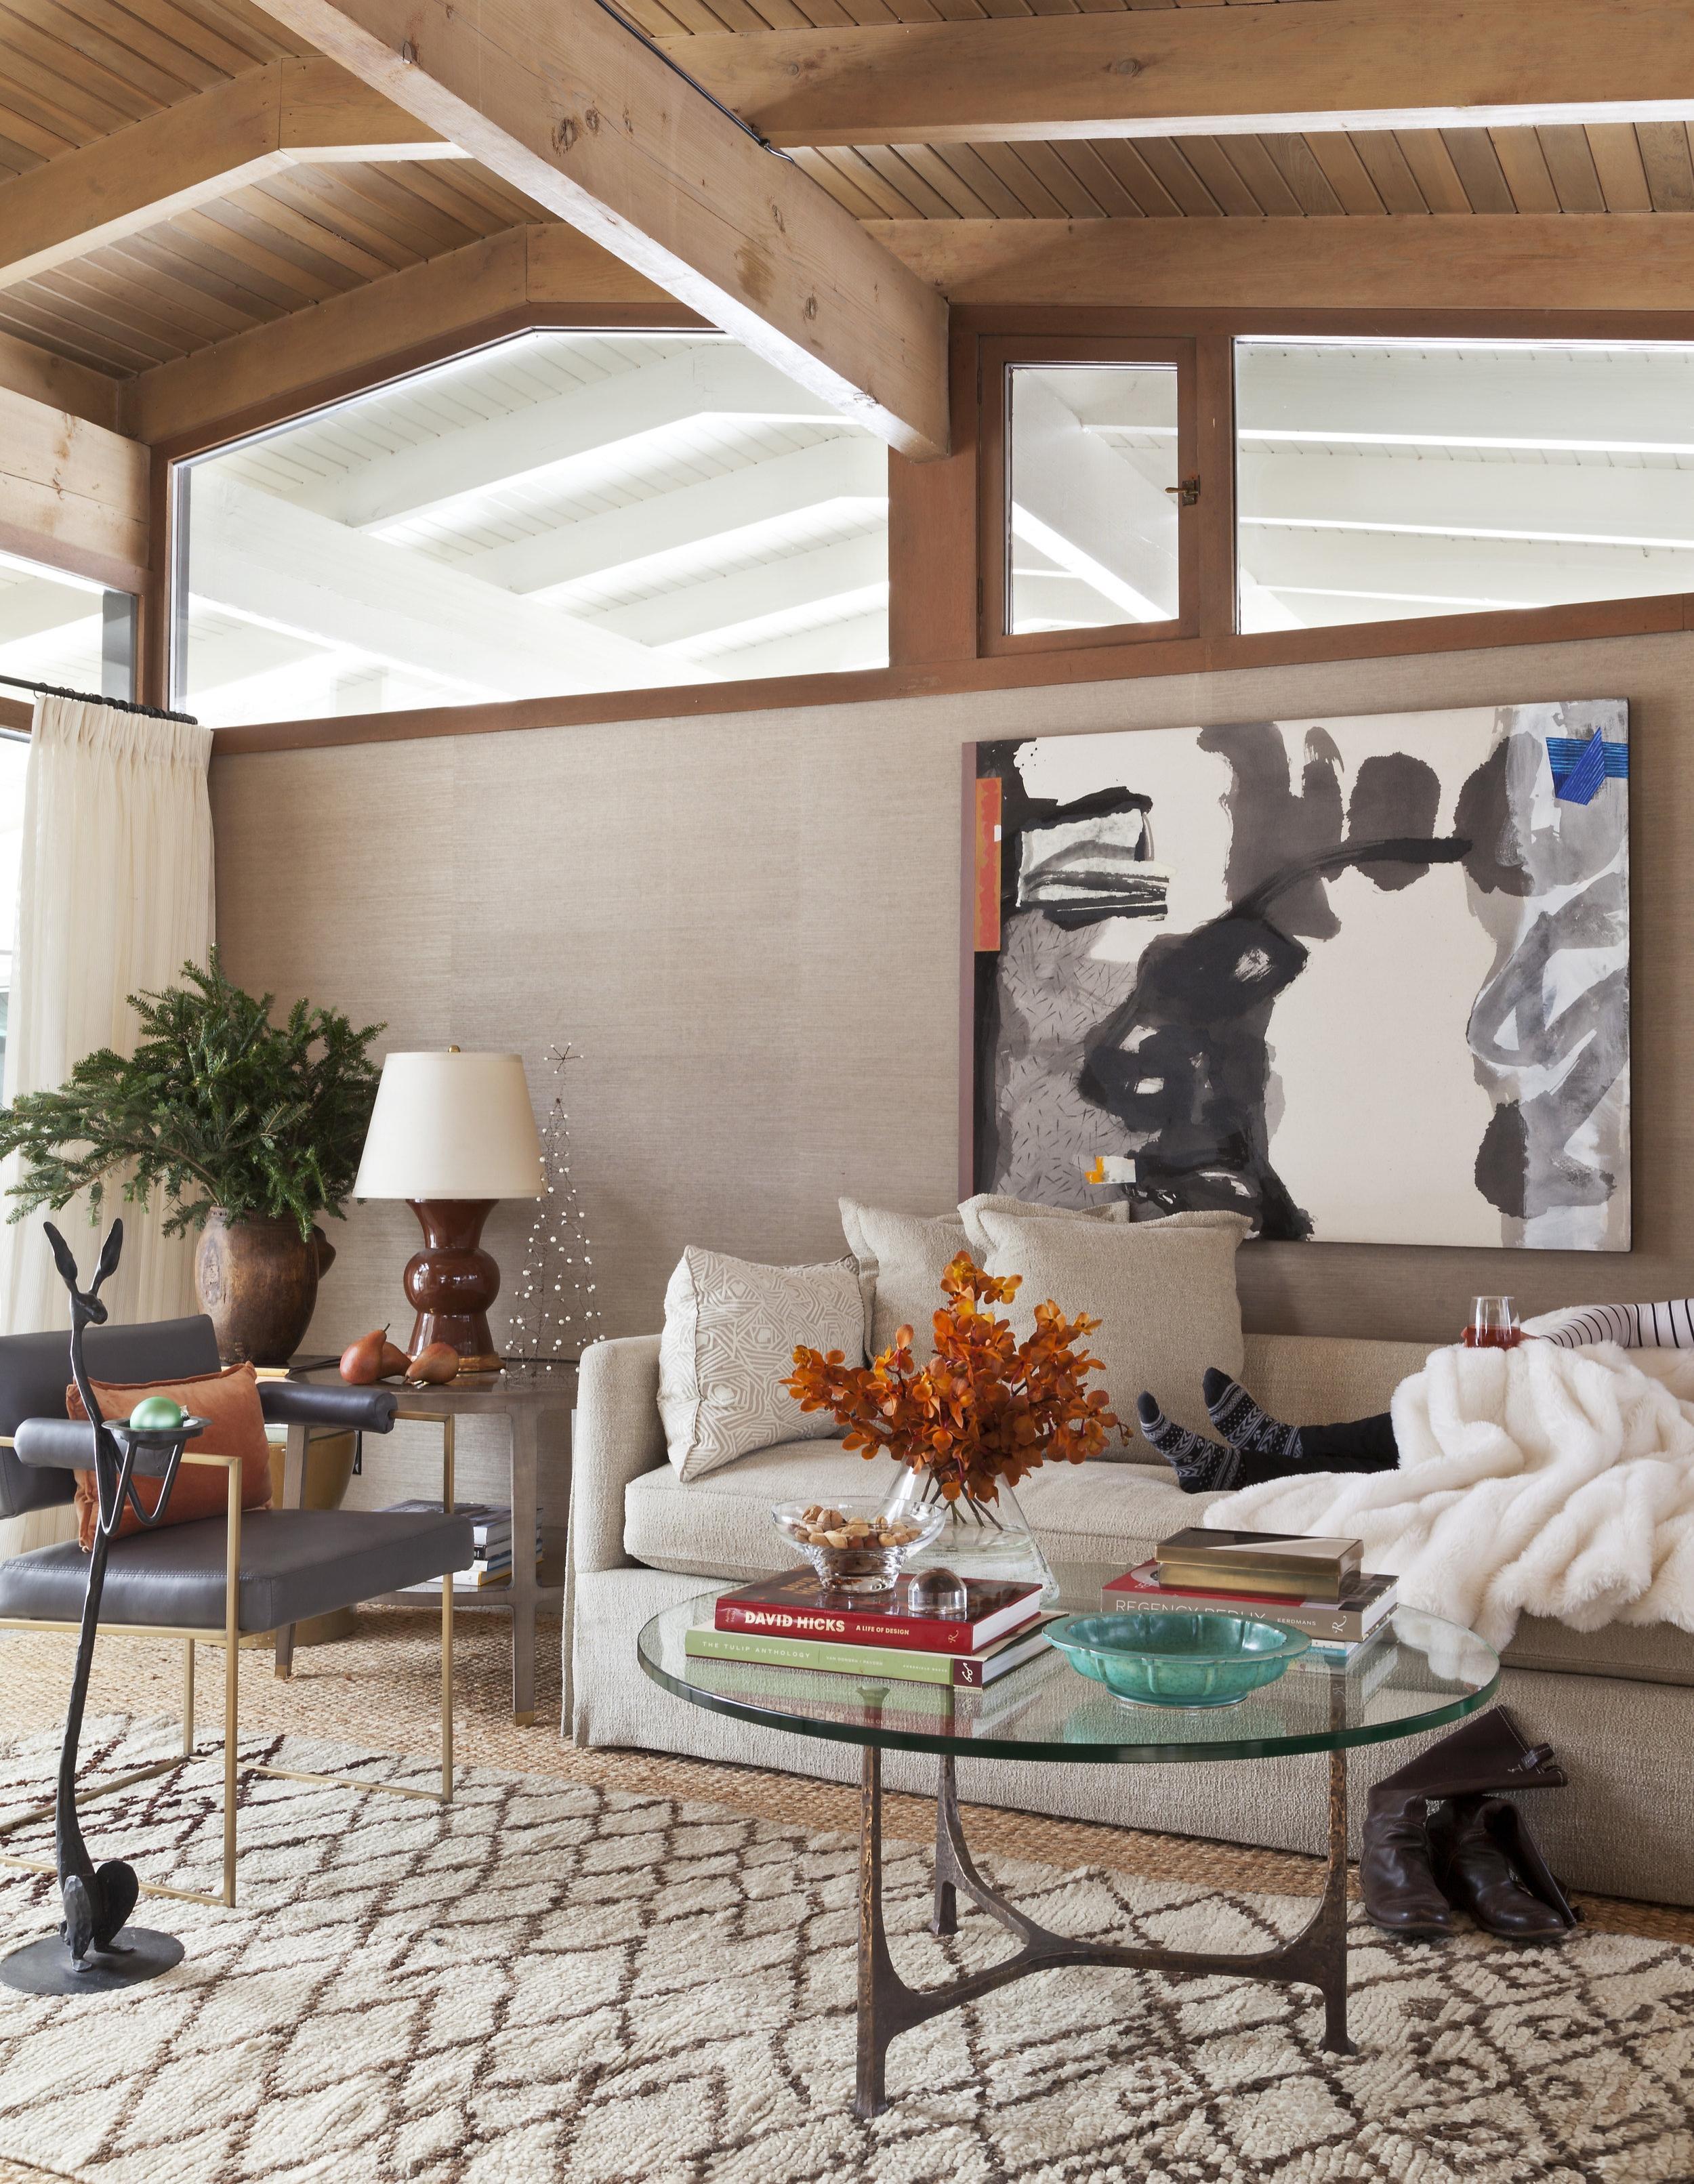 Private Residence. Design: C + A Interiors .Photographer: Emily MInton Redfield. Artist: Ben Strawn.